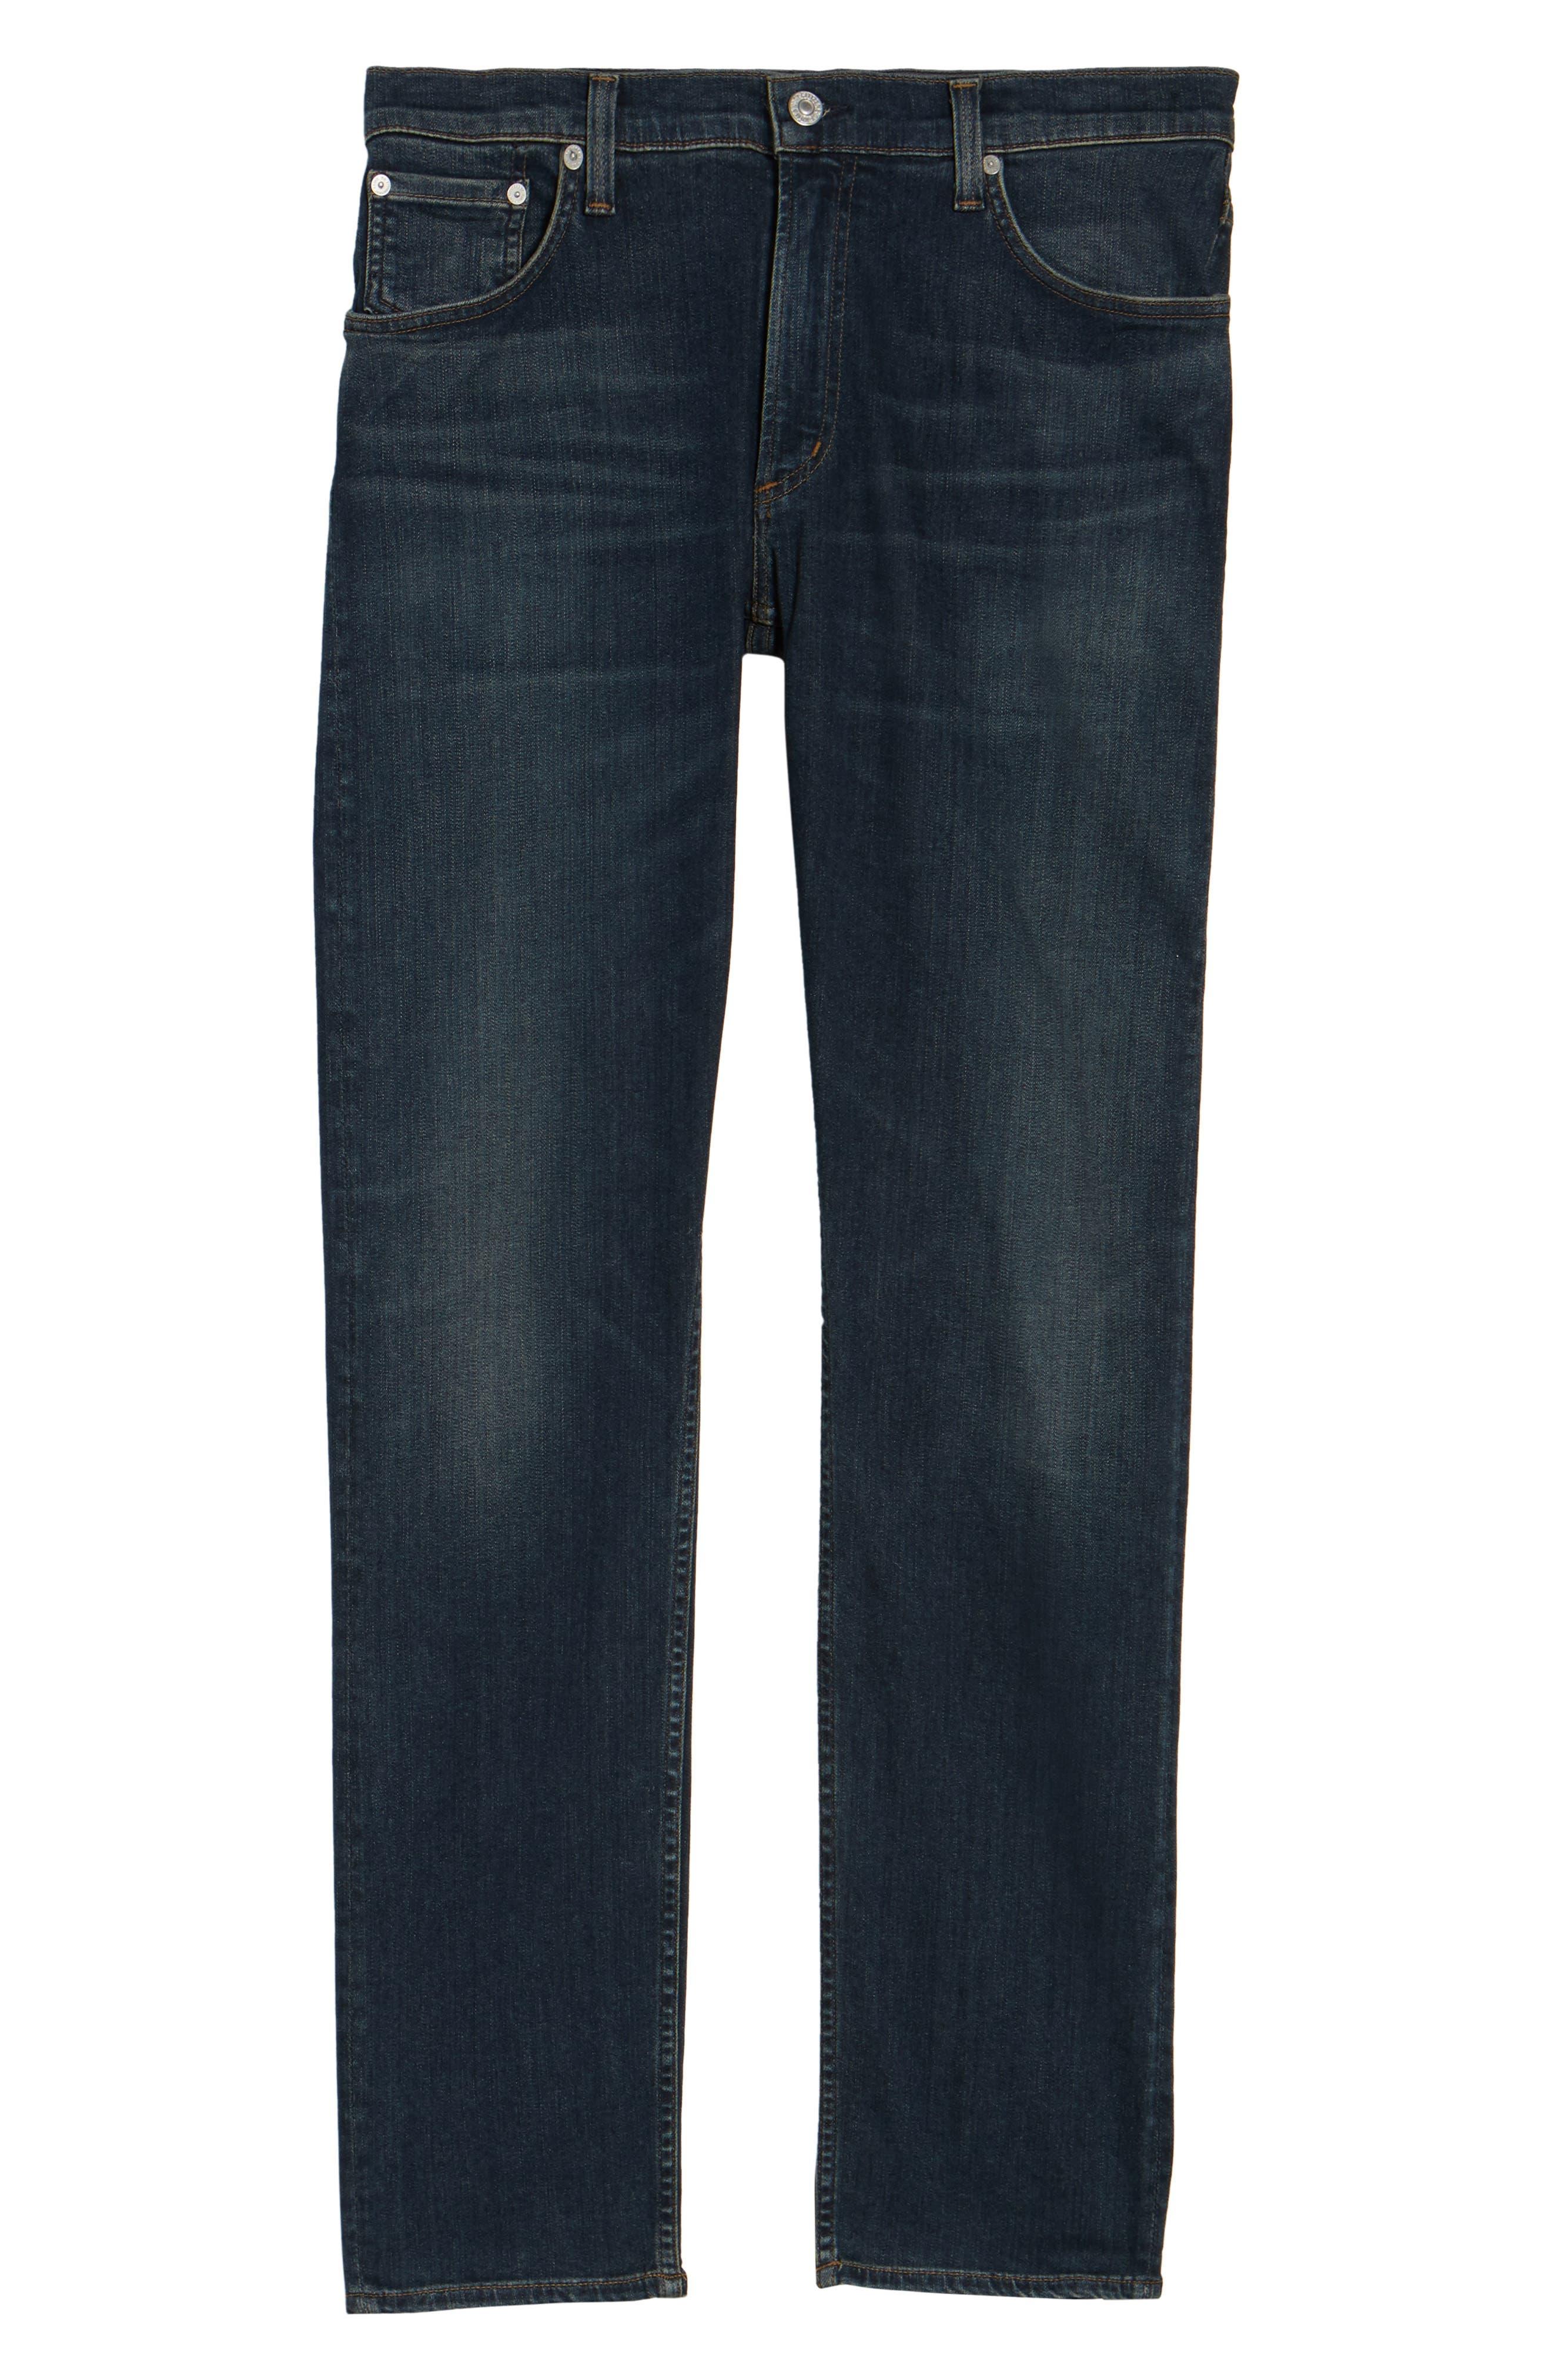 PERFORM - Bowery Slim Fit Jeans,                             Alternate thumbnail 6, color,                             Kingman